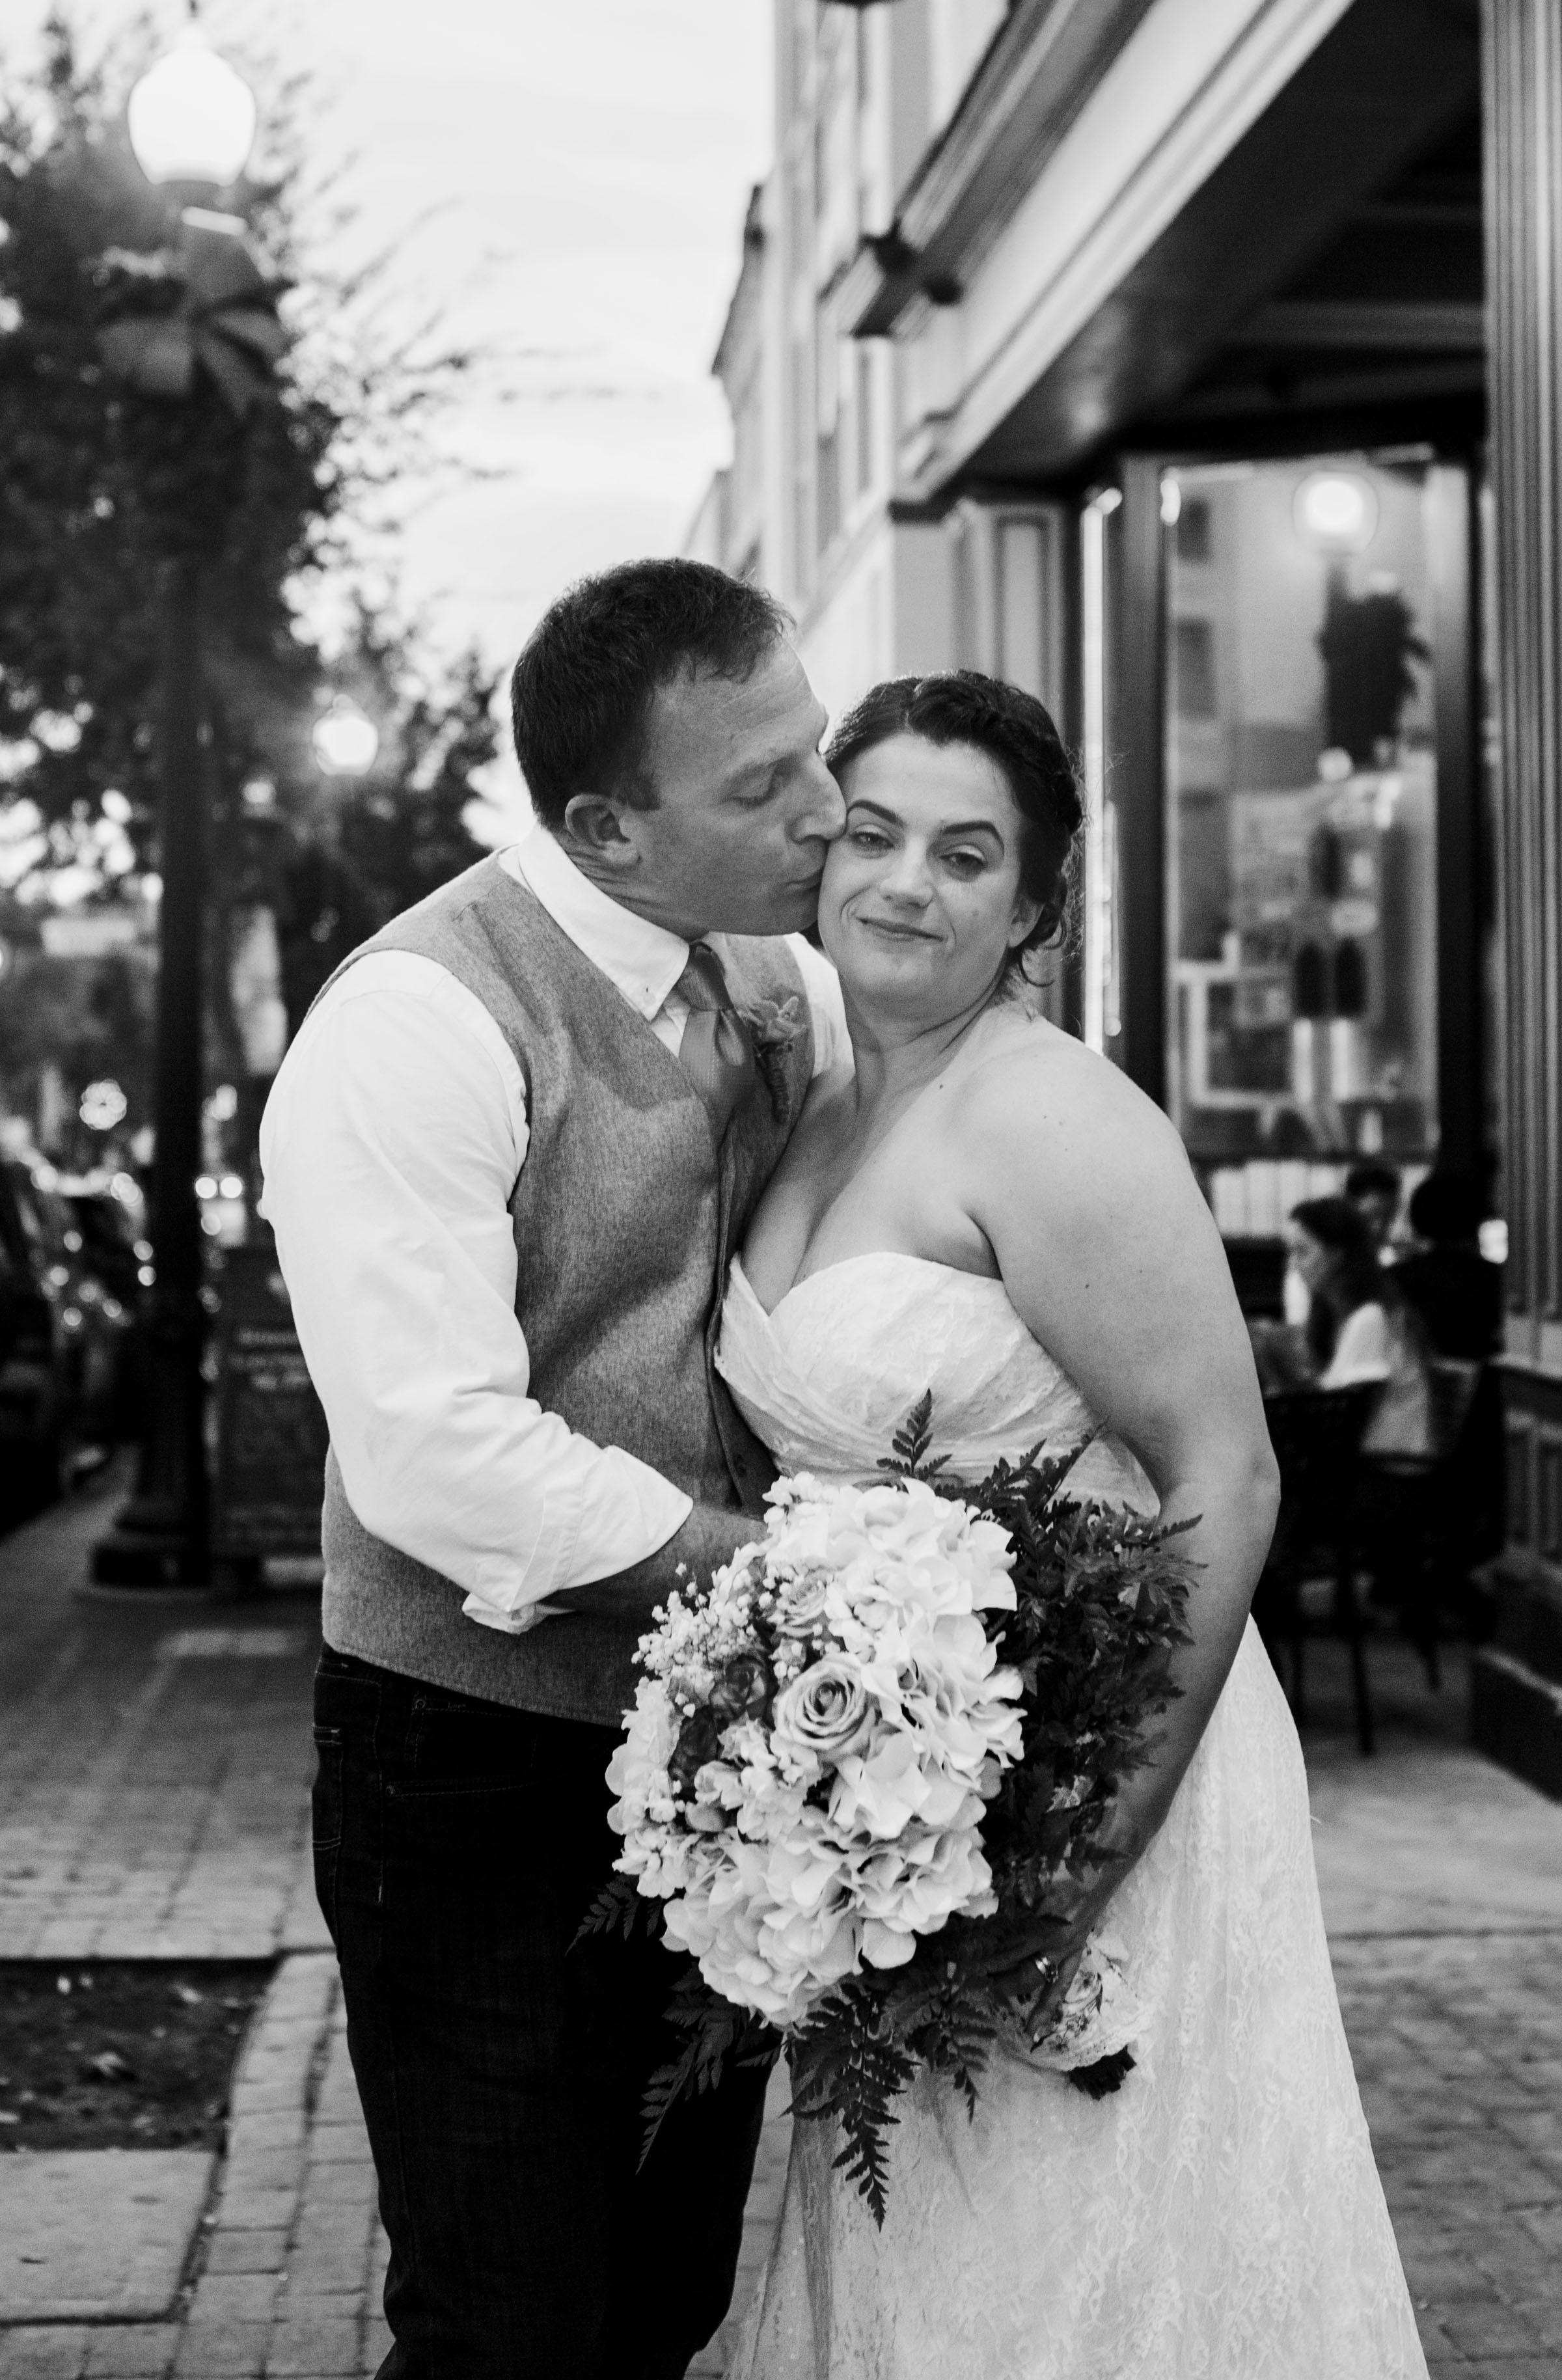 Wilmington_NC_Wedding_Photographer_Tiffany_Abruzzo_Photography_The_Beam_Room_Group_50.jpg